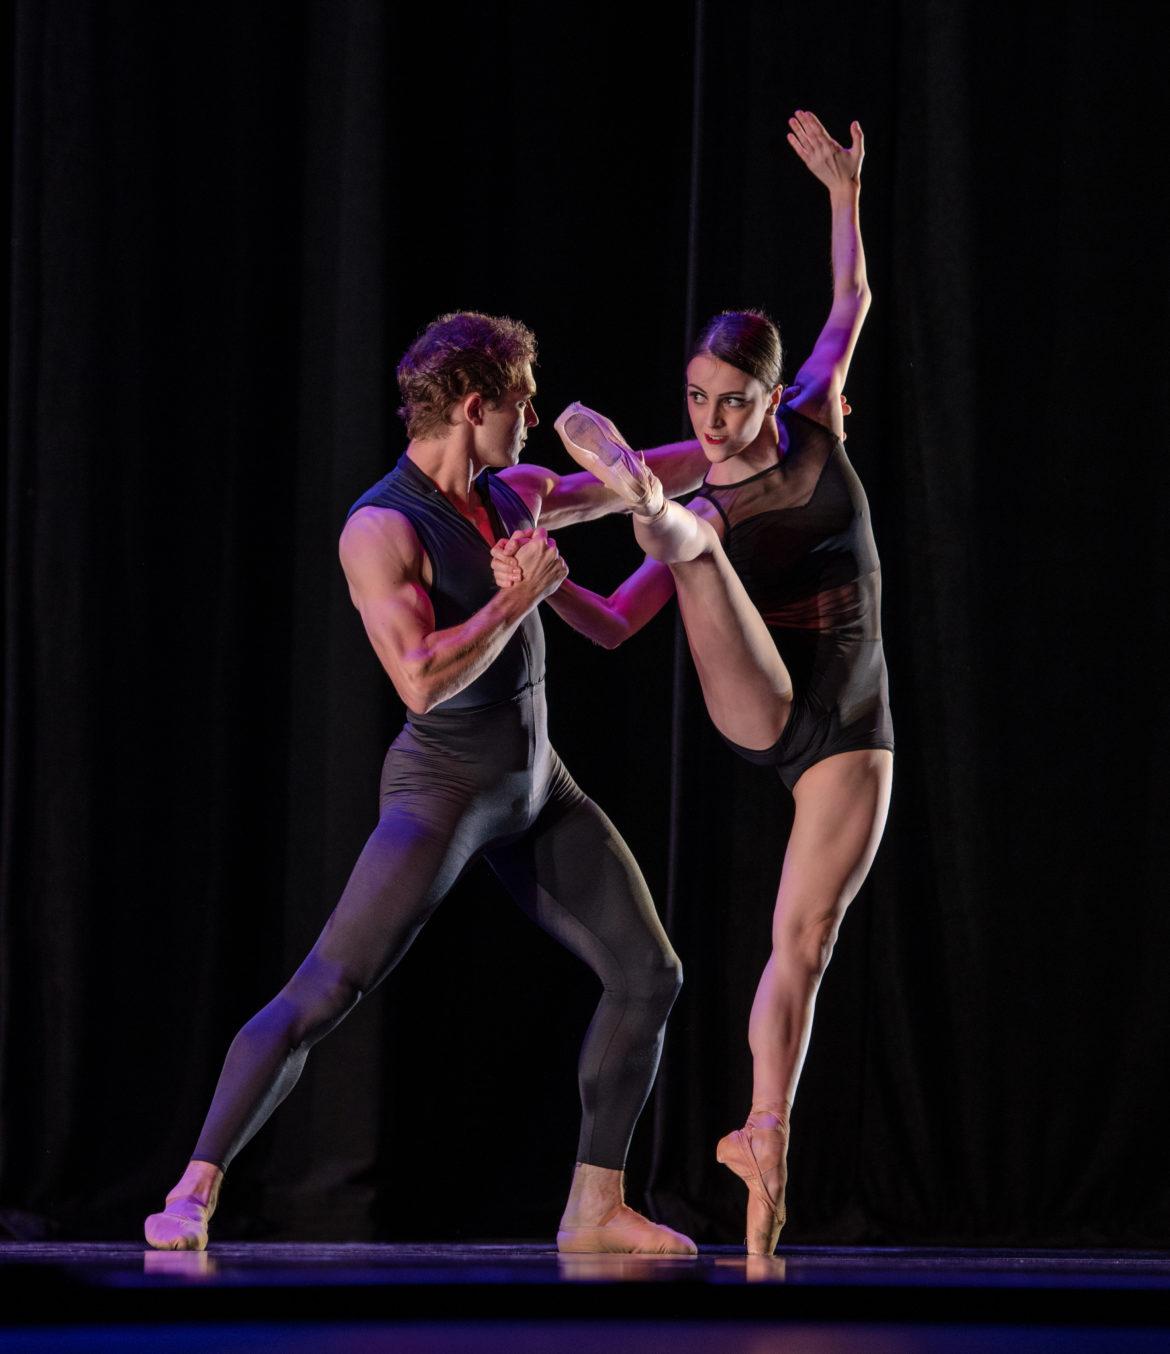 USA IBC ballet performer Katherine Barkman